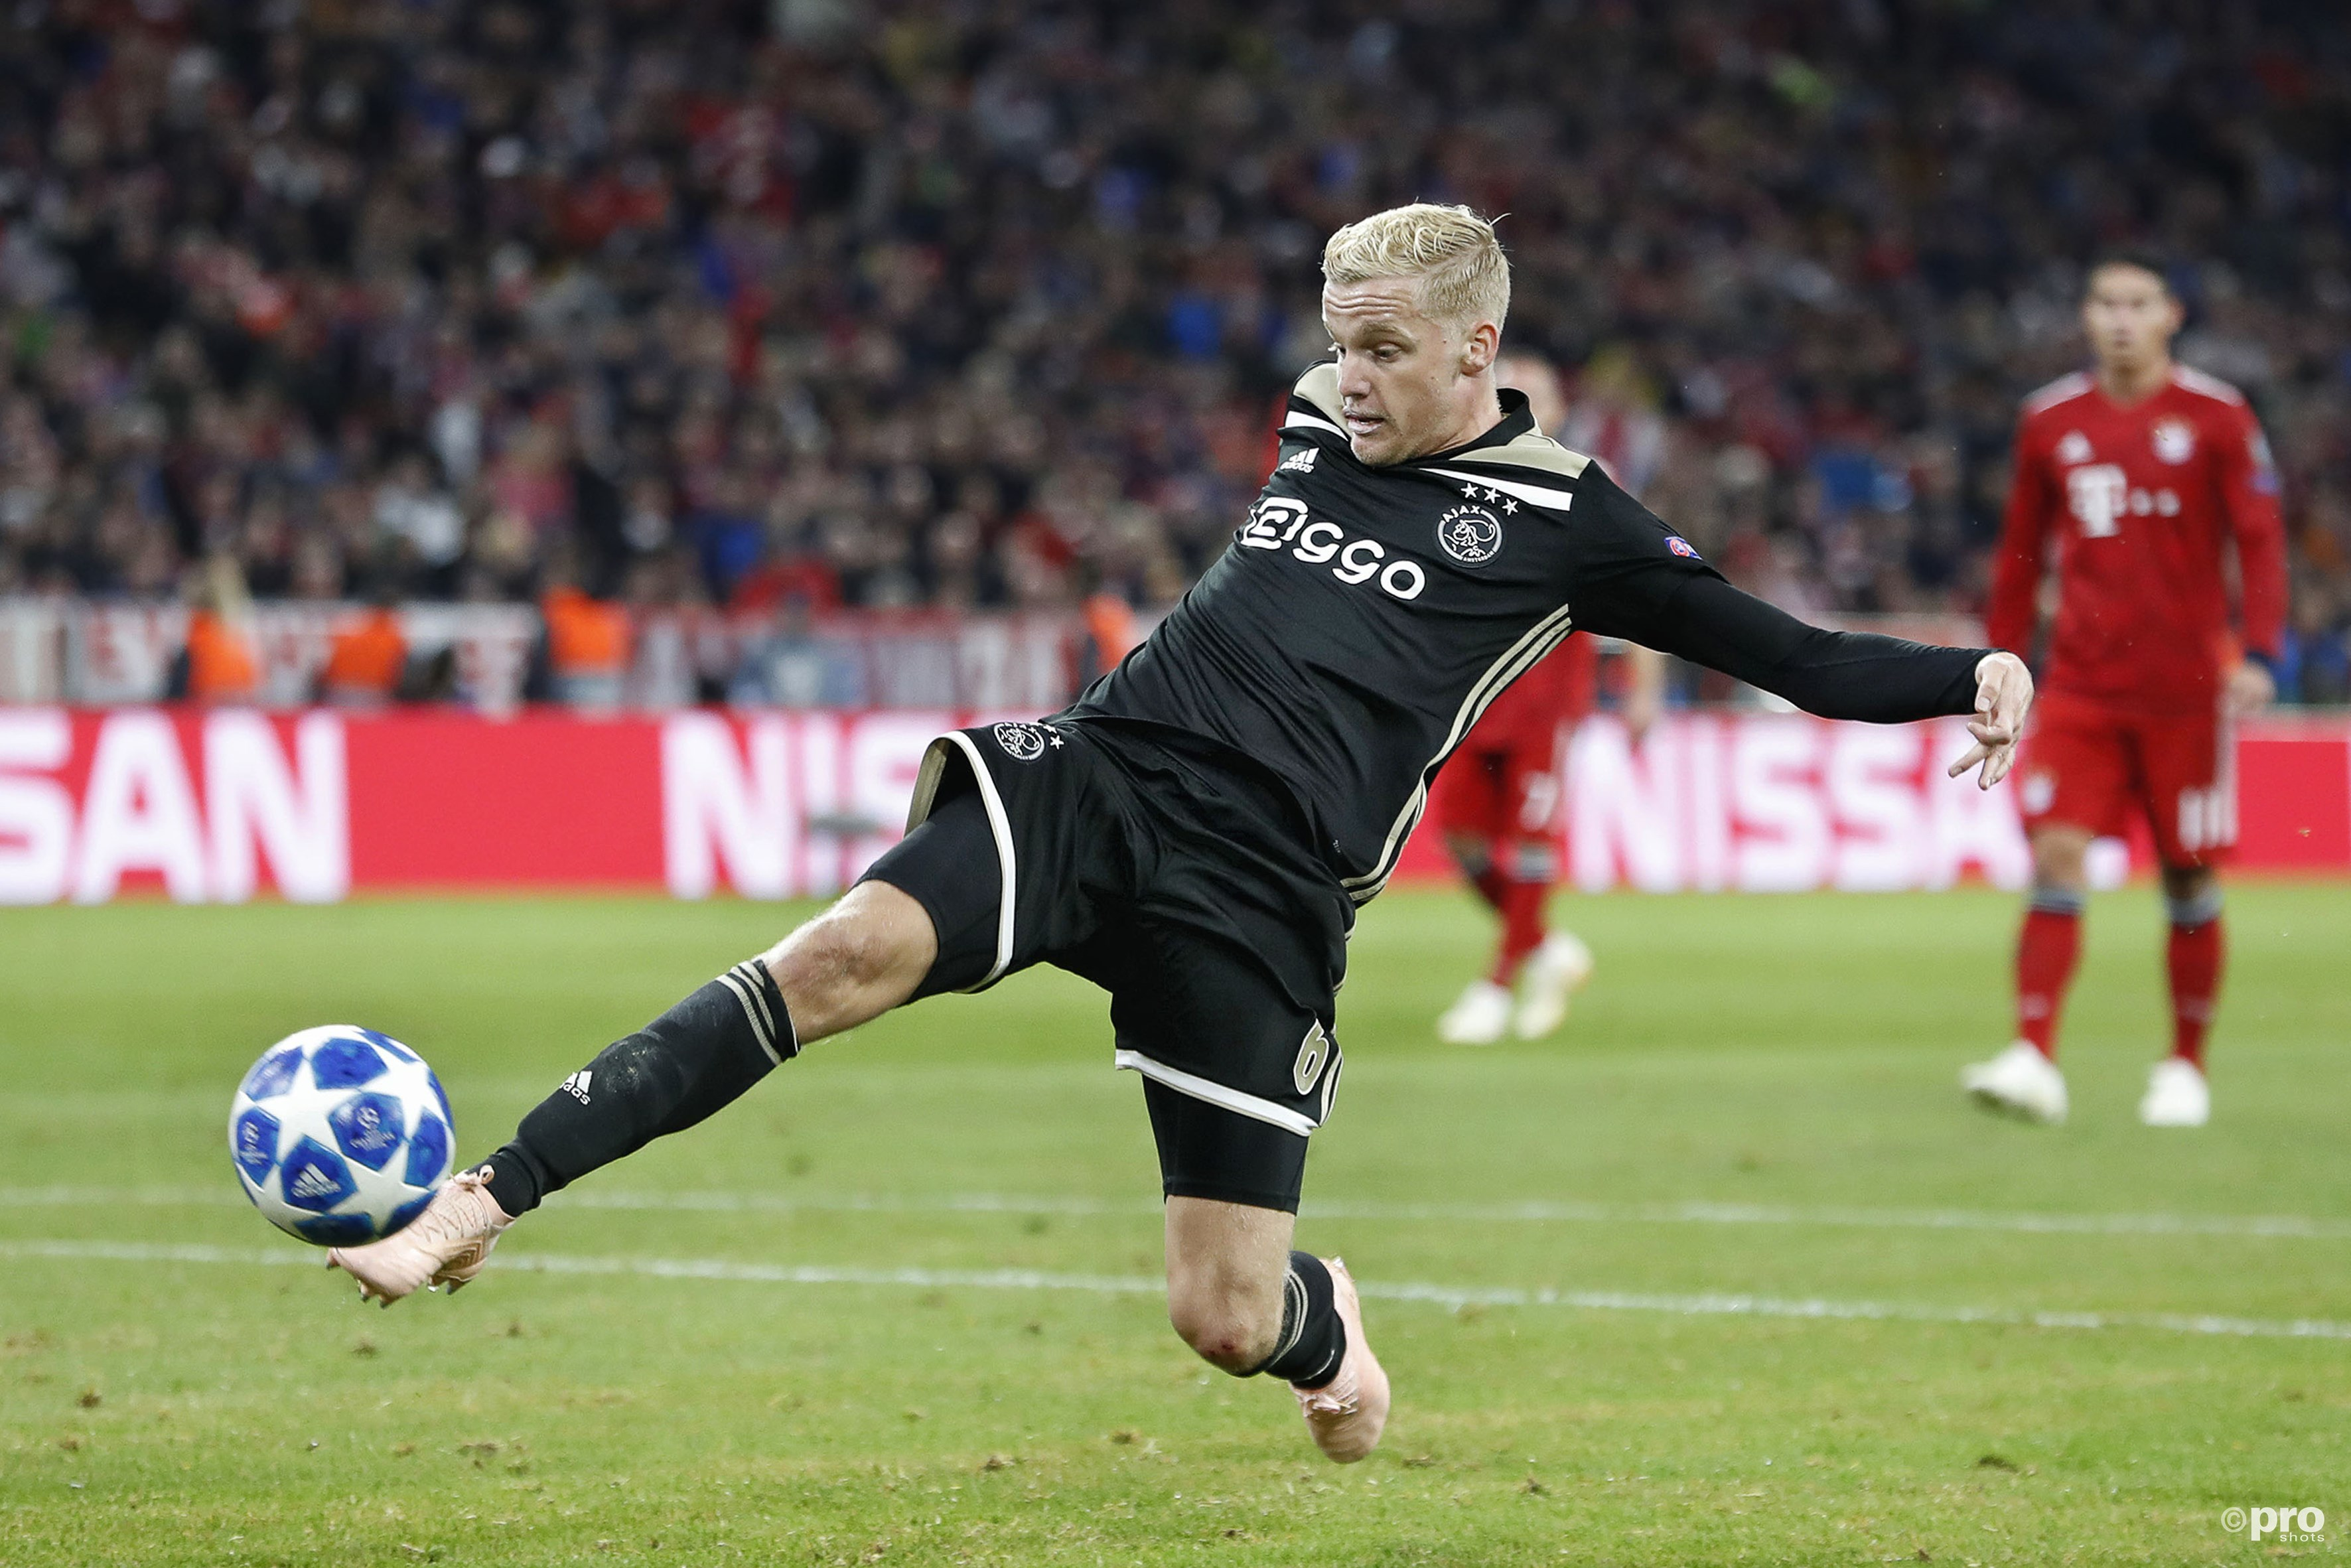 Ajax neemt punt mee na mooi voetbalgevecht in München (Pro Shots / Stanley Gontha)